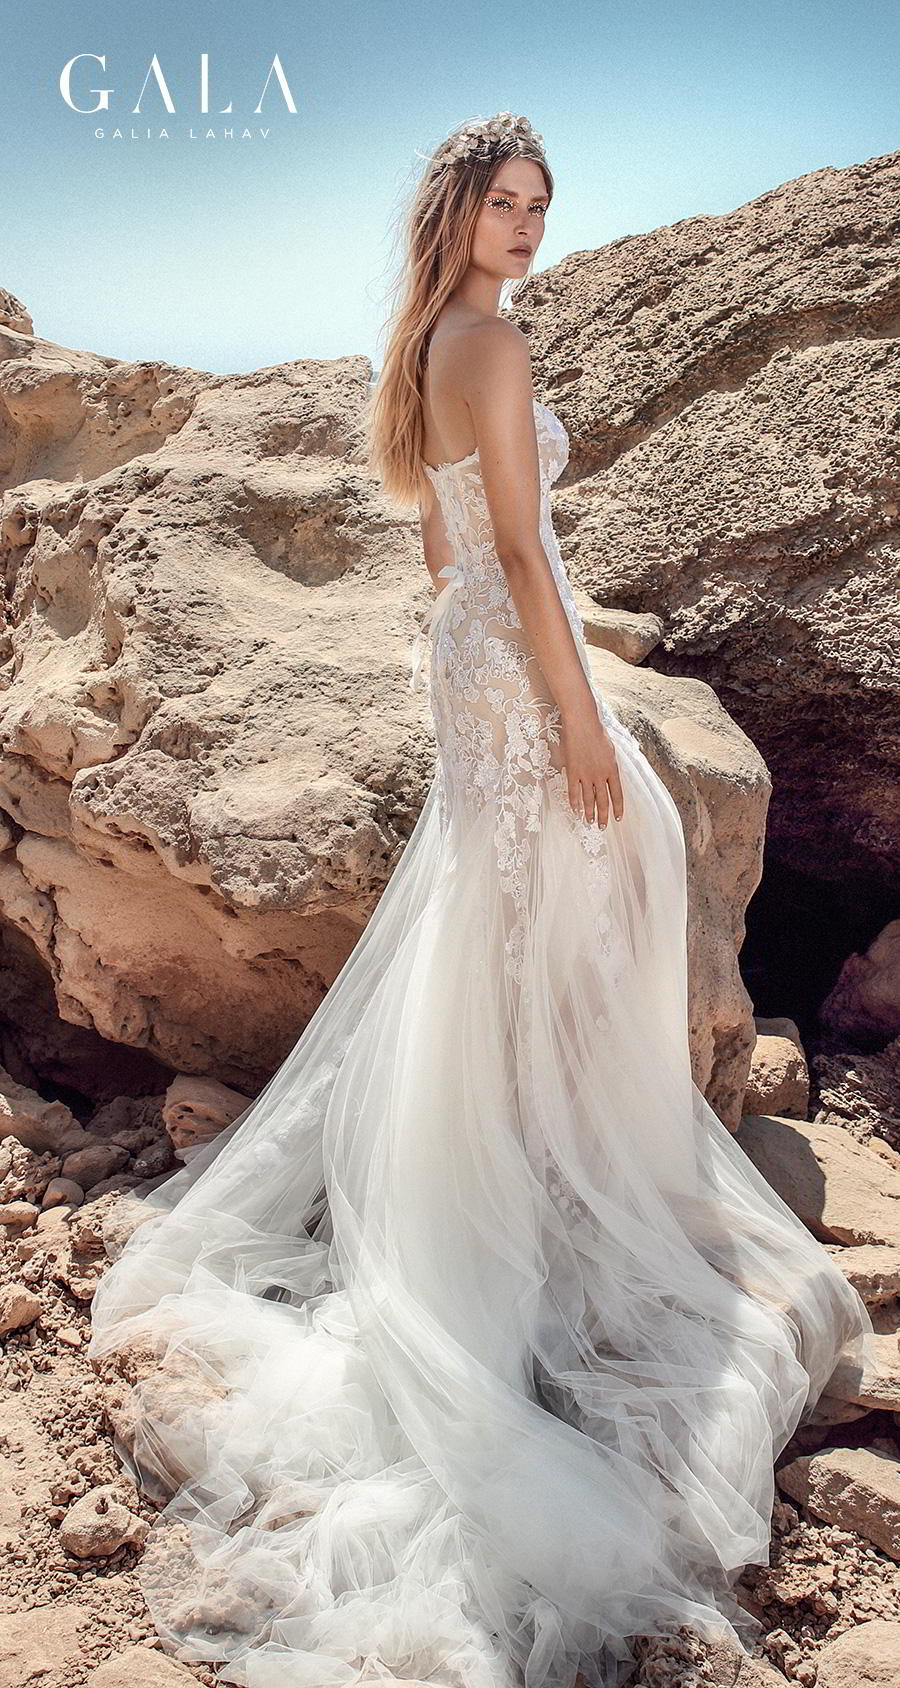 galia lahav fall 2020 gala no 9 bridal strapless sweetheart neckline heavily embellished bodice romantic fit and flare trumpet wedding dress chapel train (409) bv